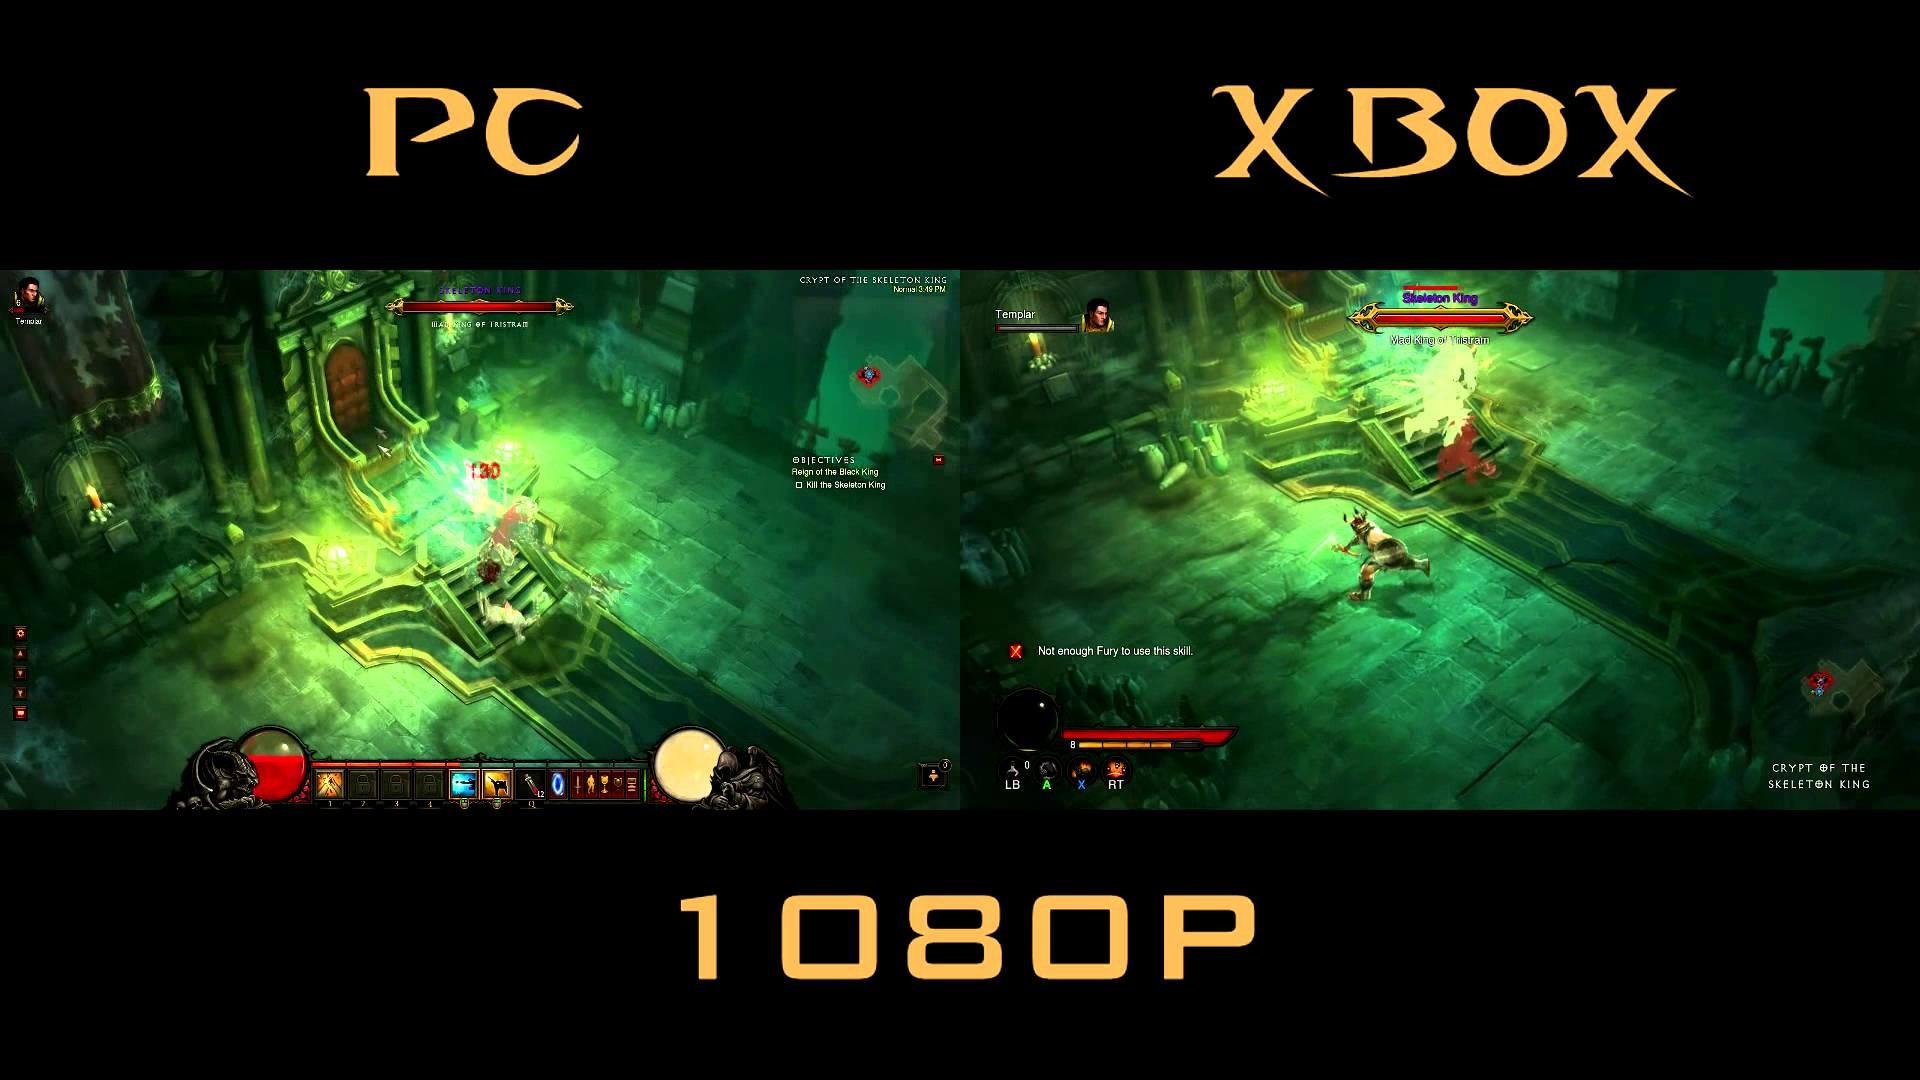 … wallpaper : pcmasterrace 0 HTML code. Diablo 3 Xbox 360 vs PC Skeleton  King Comparison side by side .